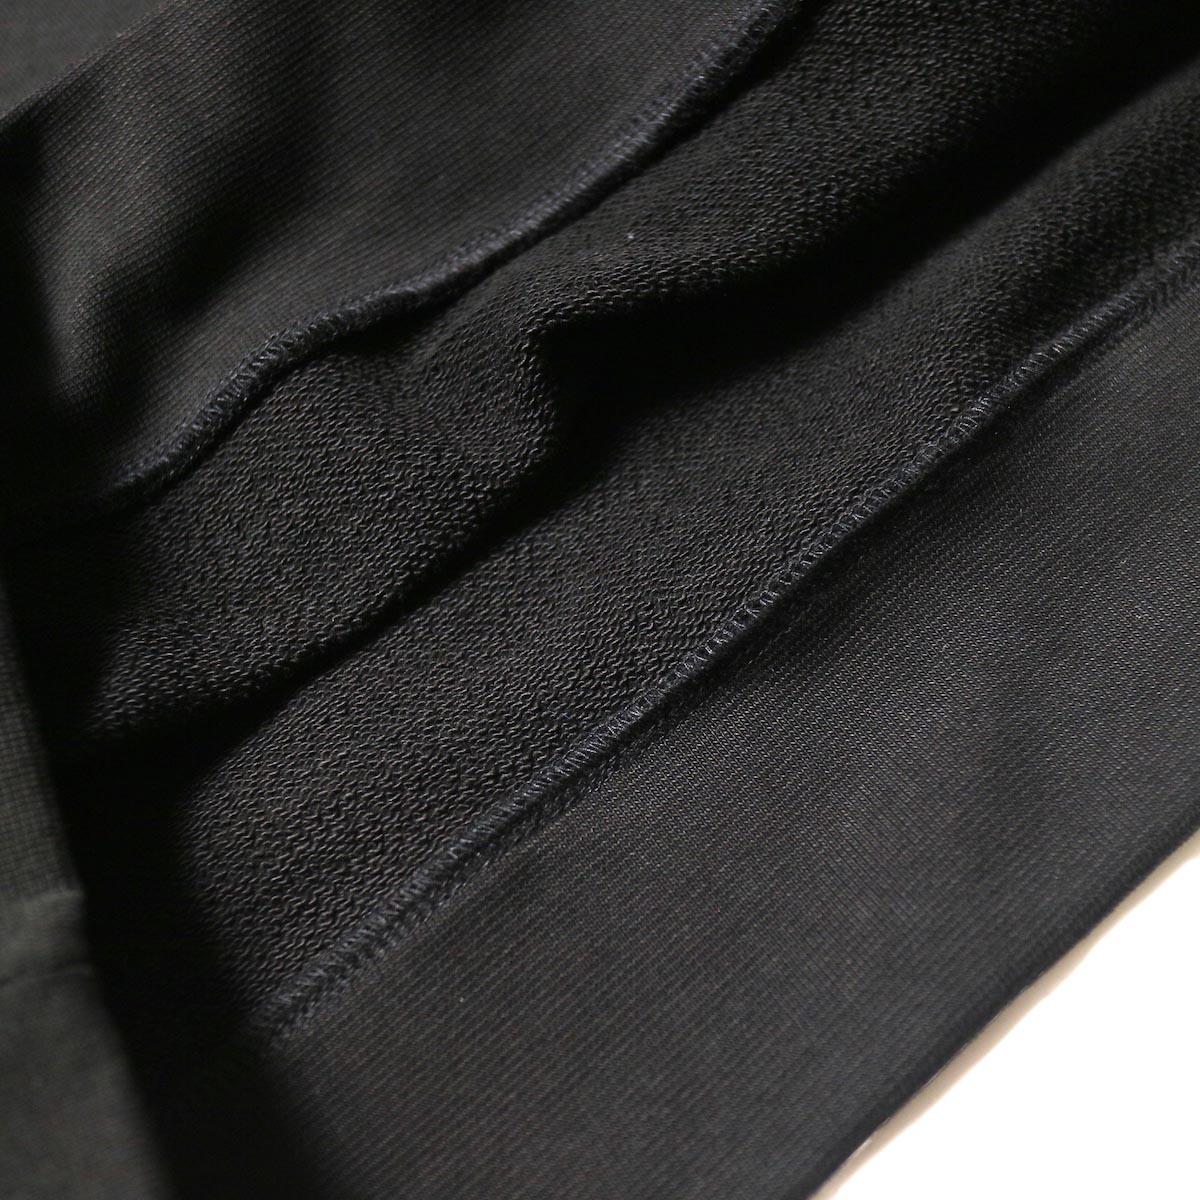 A.P.C. / VPC スウェットシャツ (black) 裏地